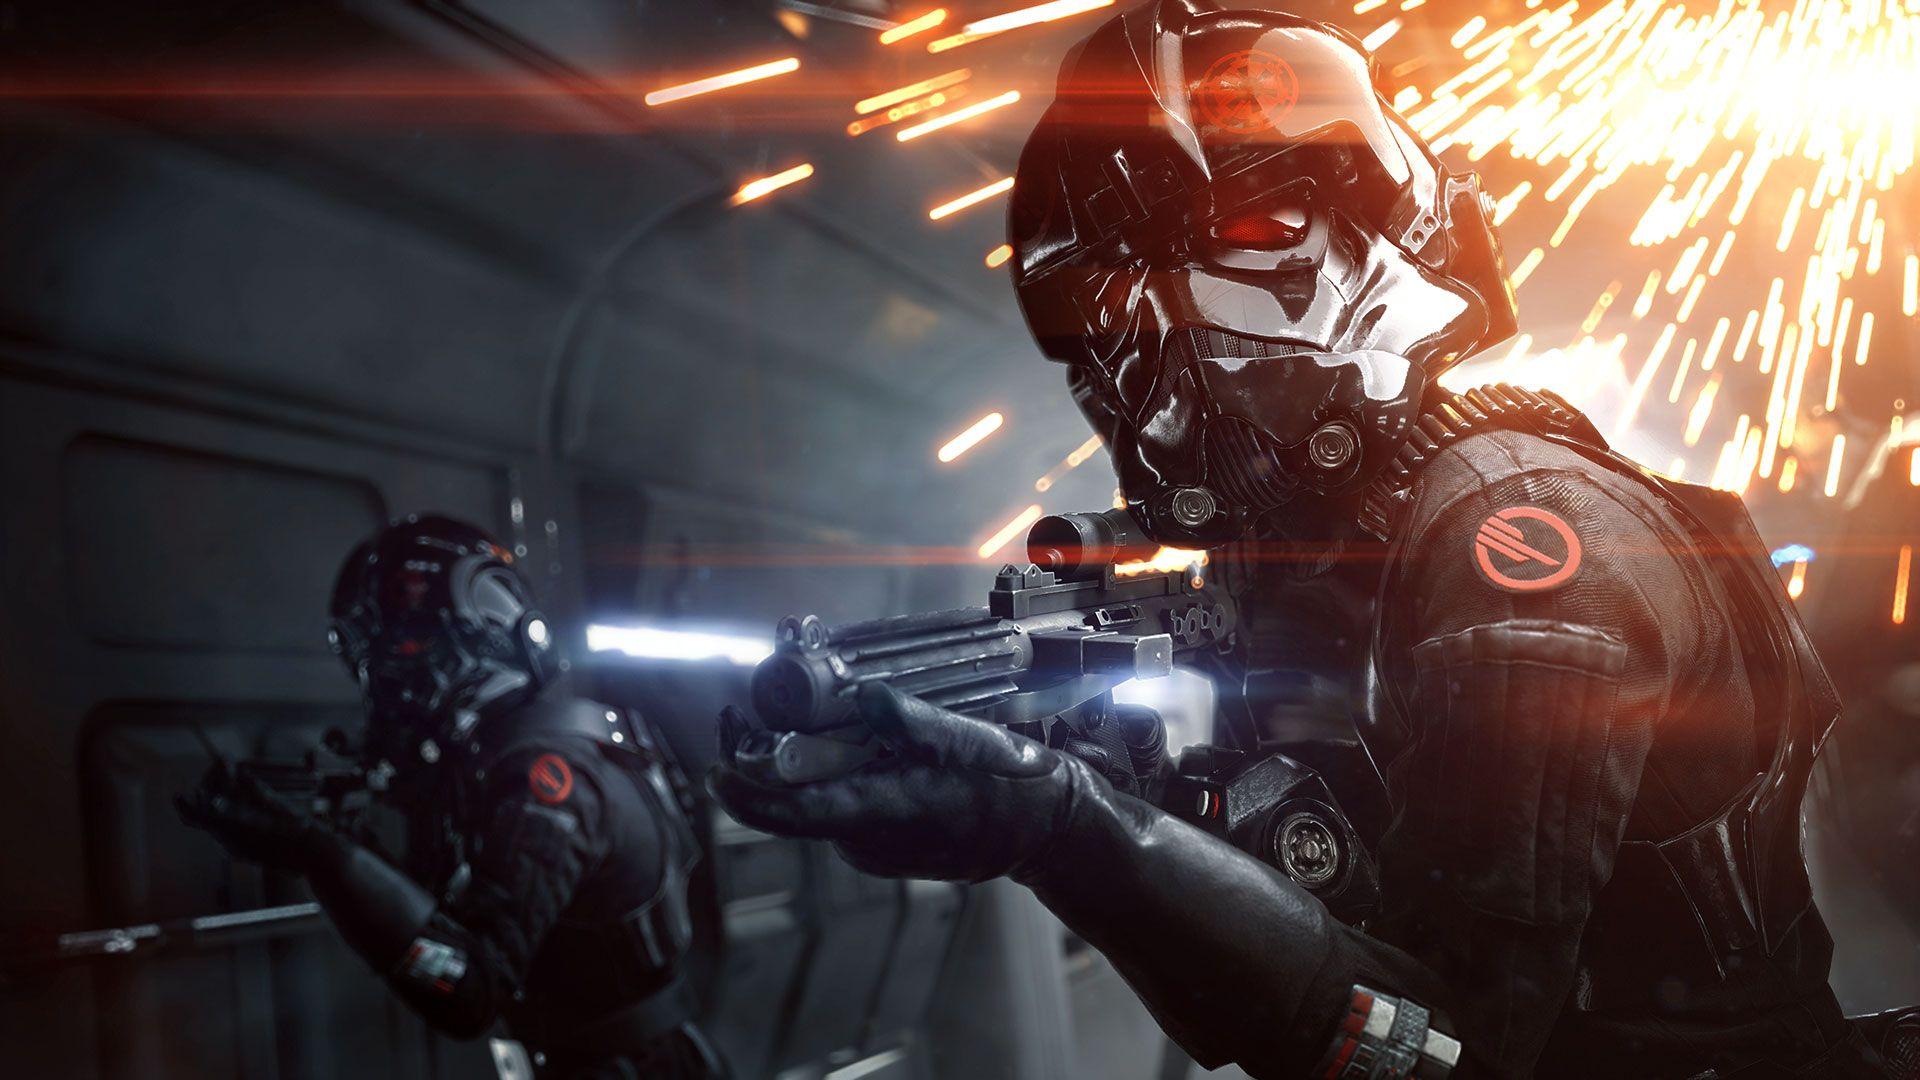 descargar crack star wars battlefront 2 pc espanol